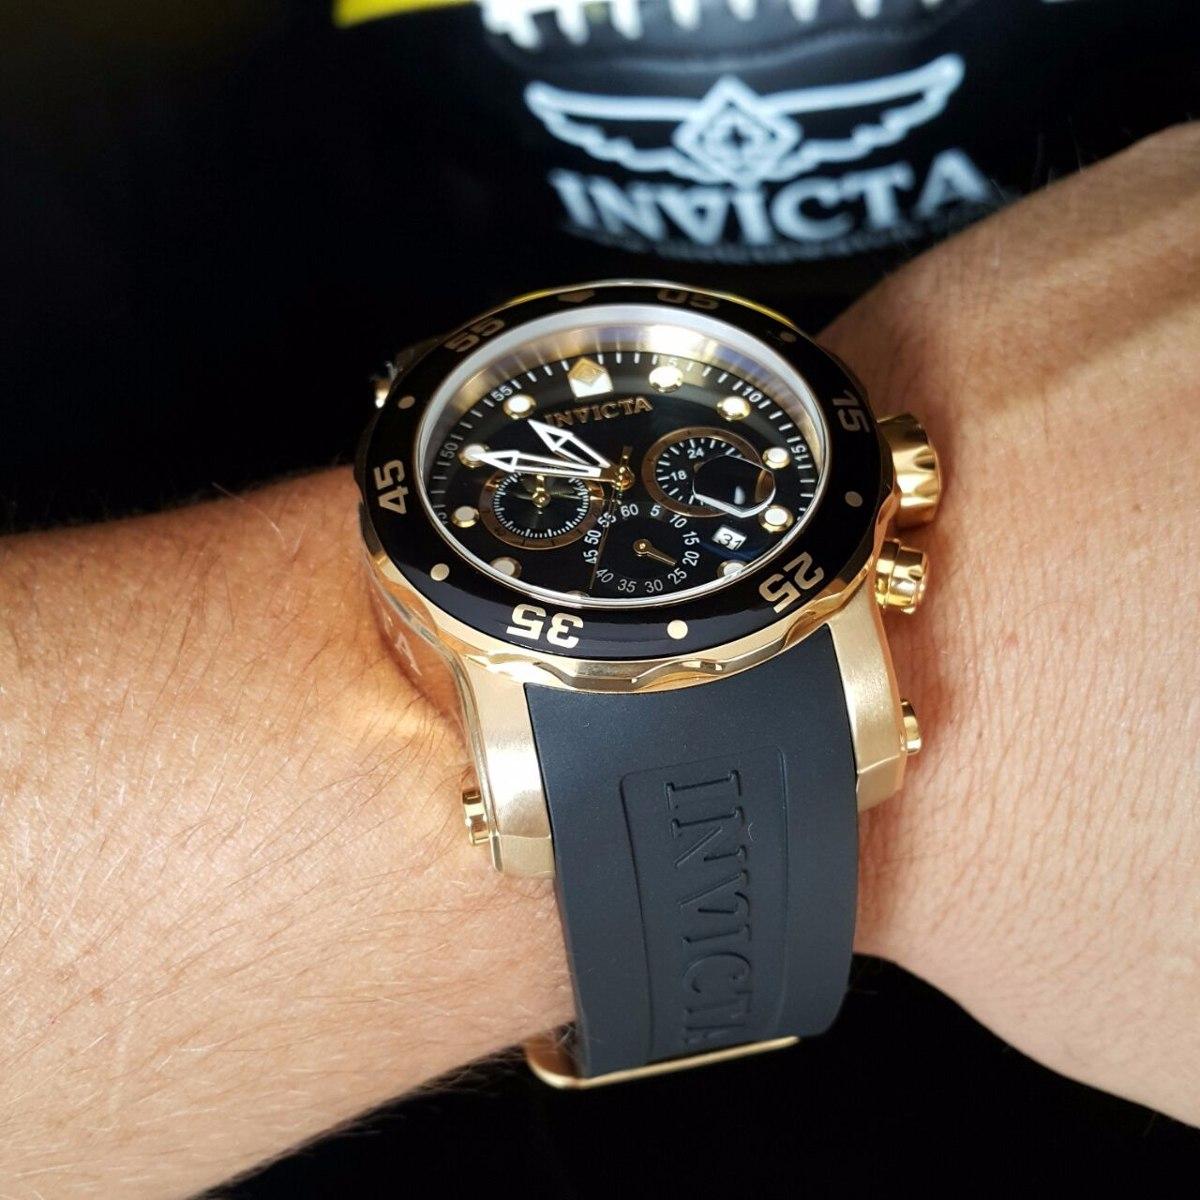 24009c324d1 relógio invicta pró diver 23650 troca pulseira masculino nov. Carregando  zoom.